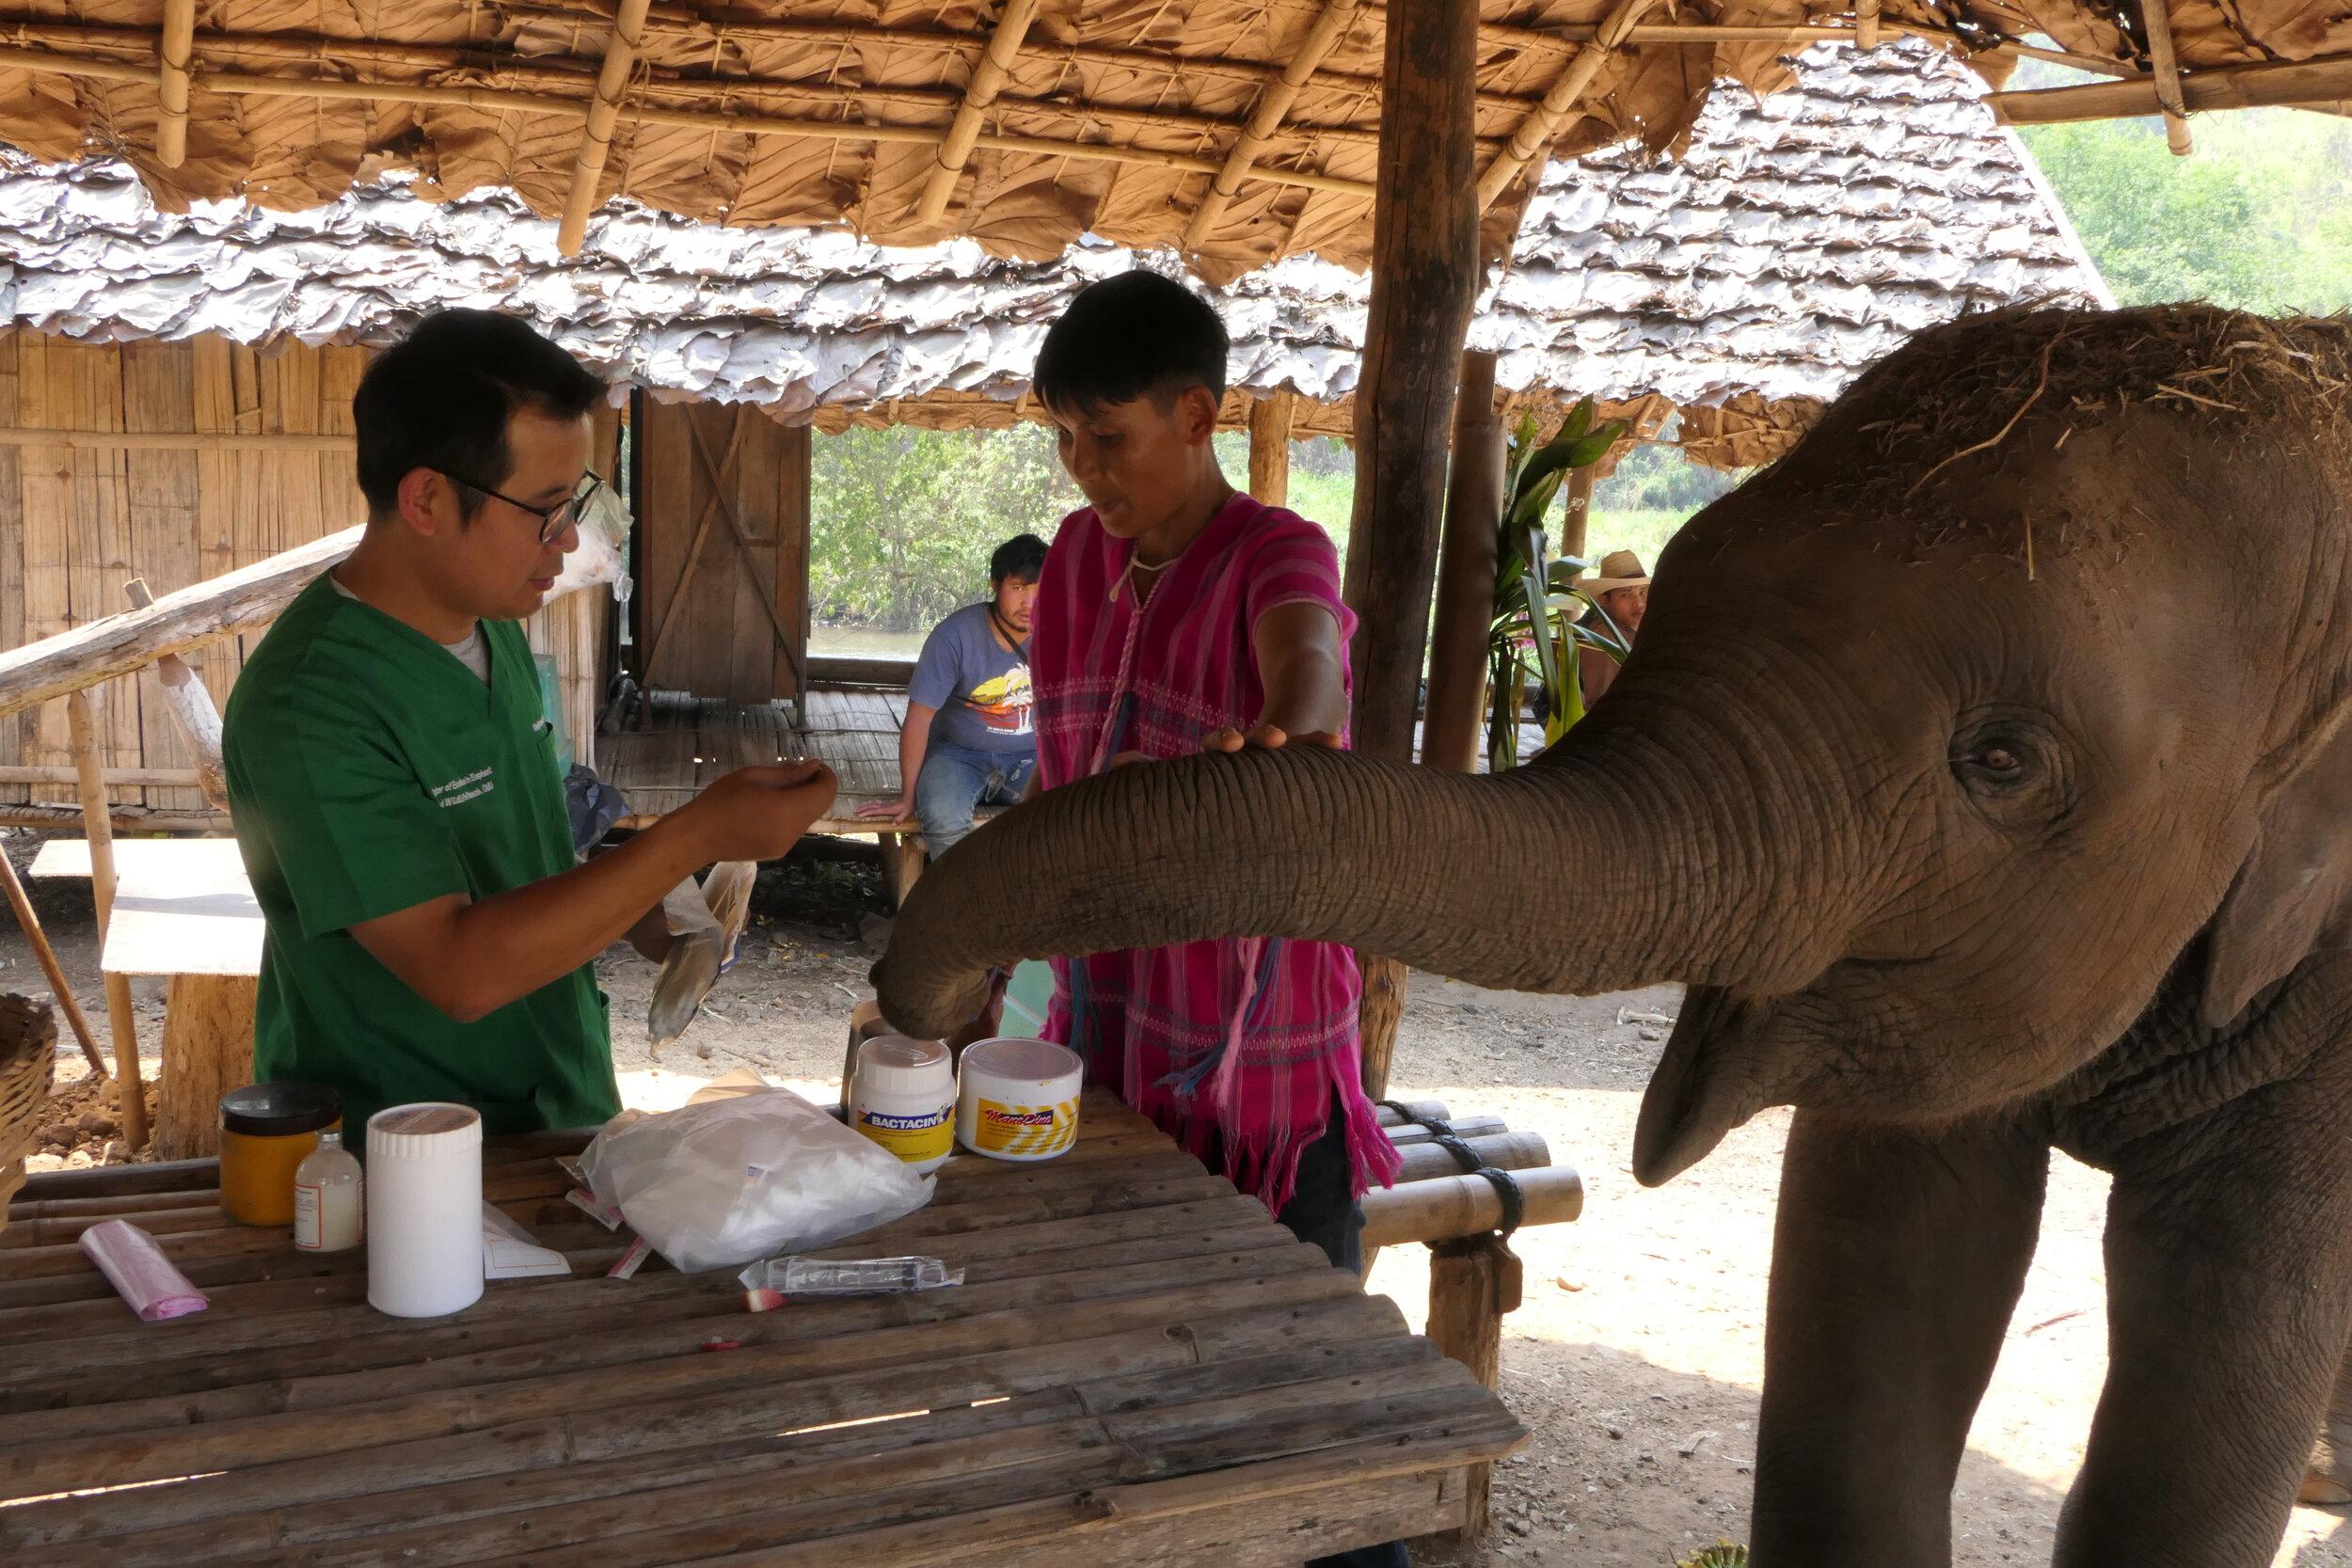 Examining and prescribing treatment at a remote camp